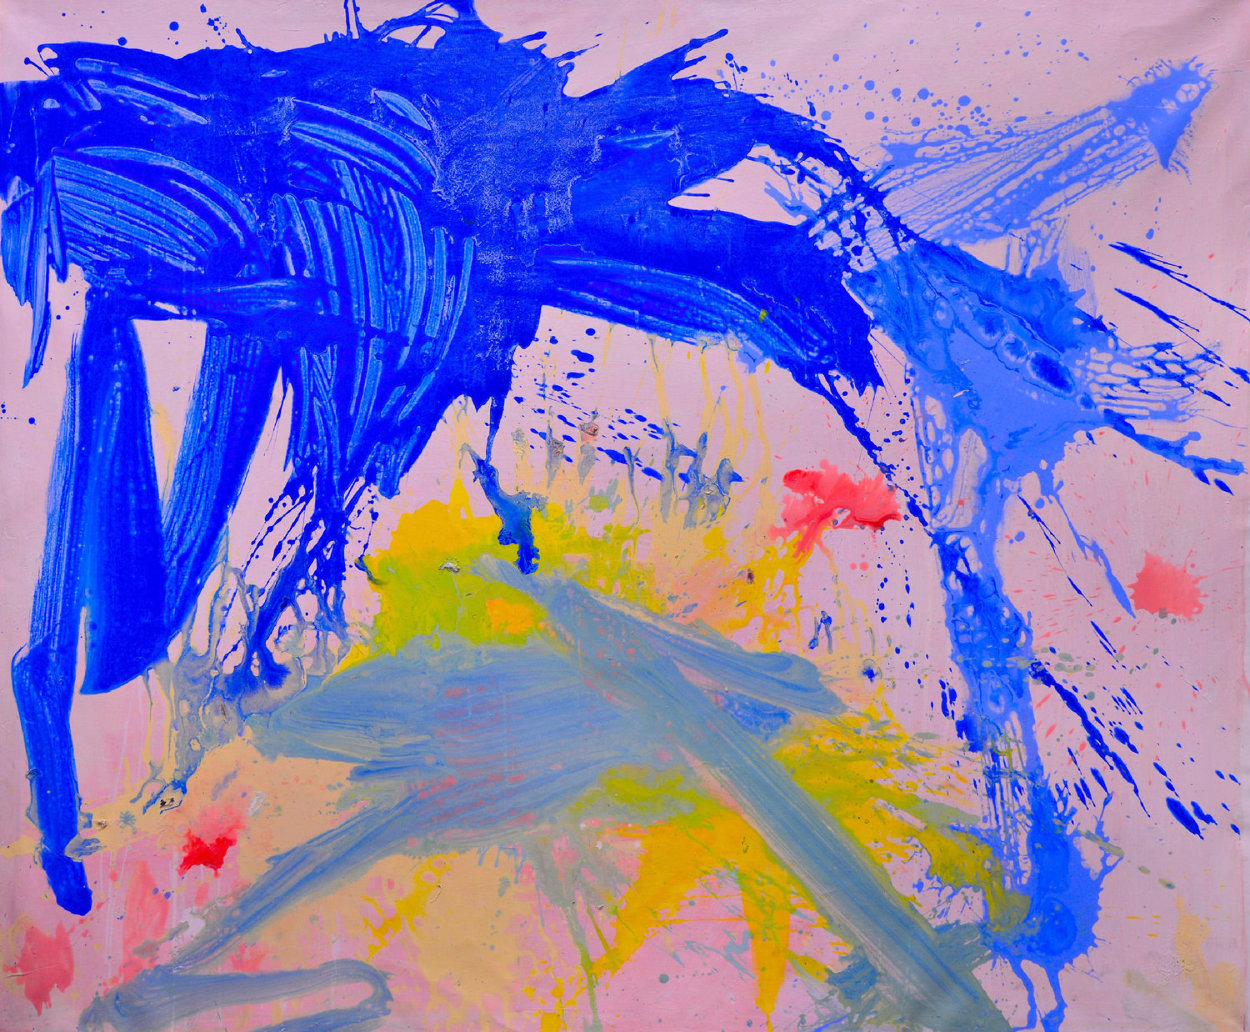 Bright Rainbow 2018 74x62 Super Huge Original Painting by Costel Iarca